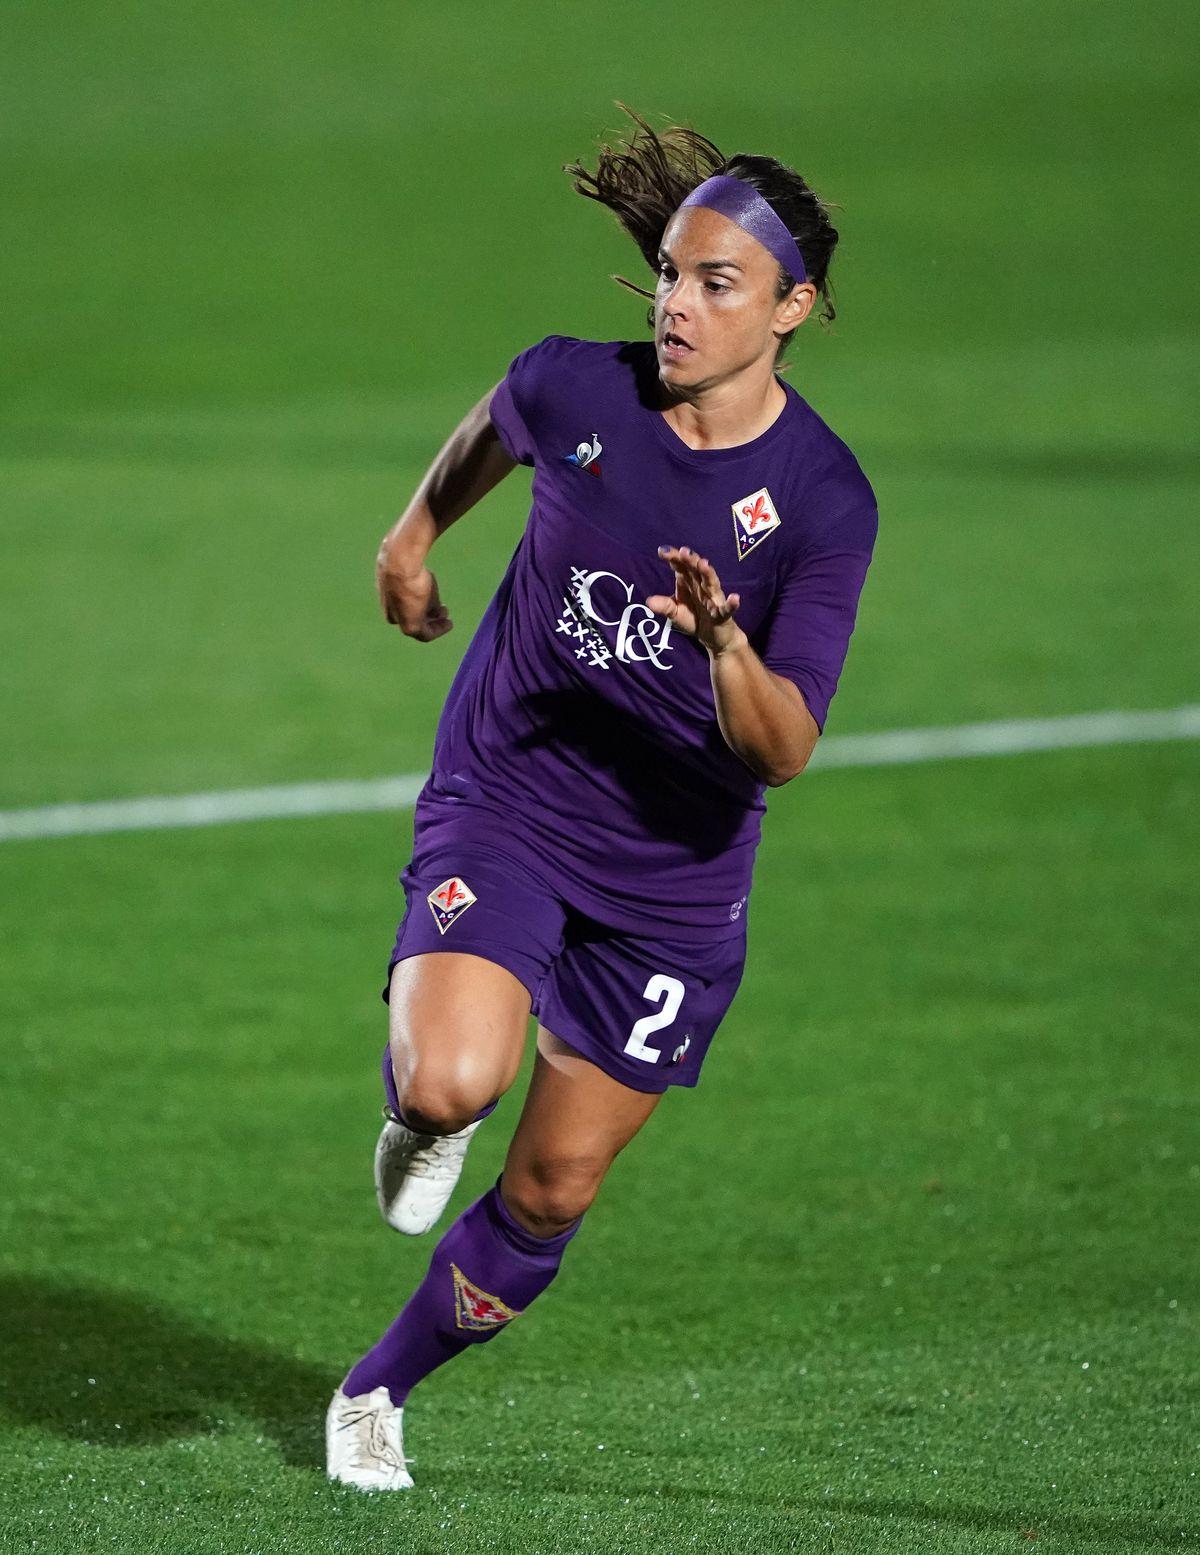 Arsenal Women v Fiorentina Women - UEFA Women's Champions League - Round of 32 - Second Leg - Meadow Park